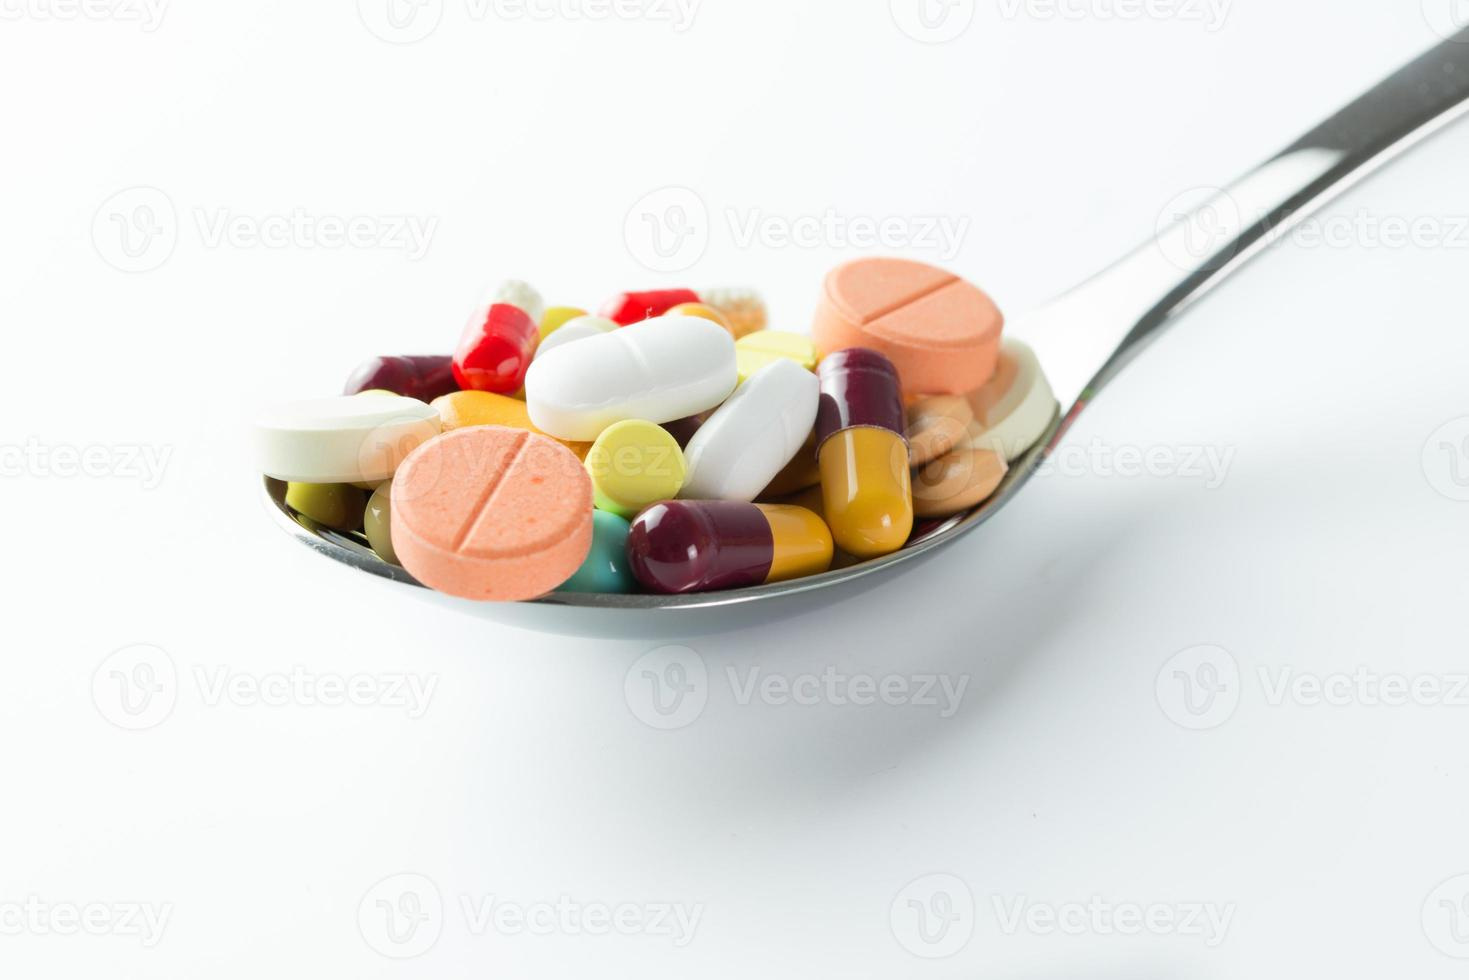 cuillère pleine de pilules de médecine photo